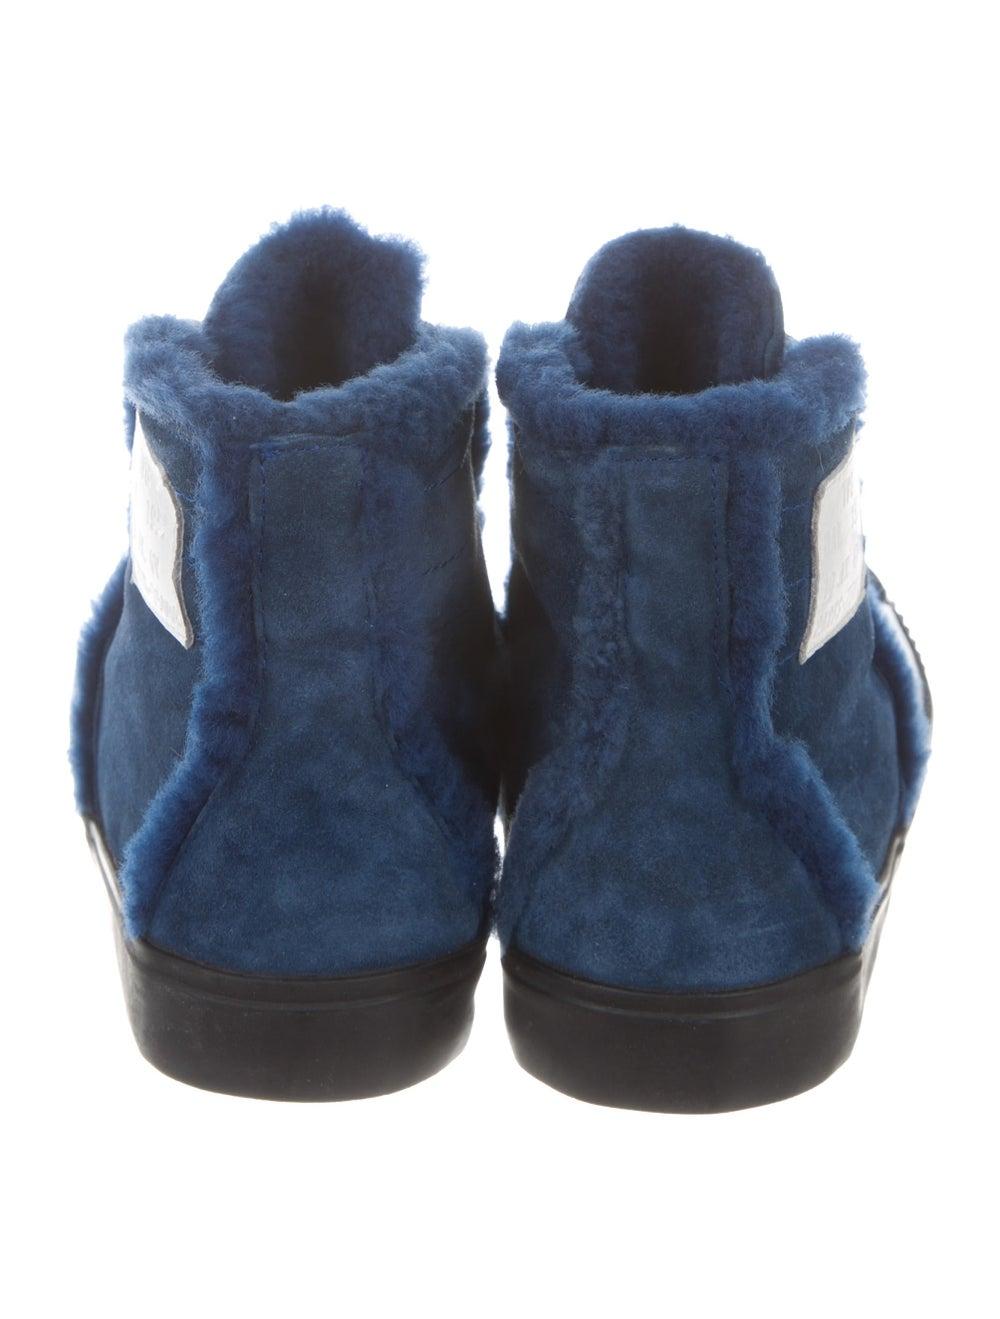 Balenciaga Cap-Toe Shearling-Trimmed Sneakers bla… - image 4